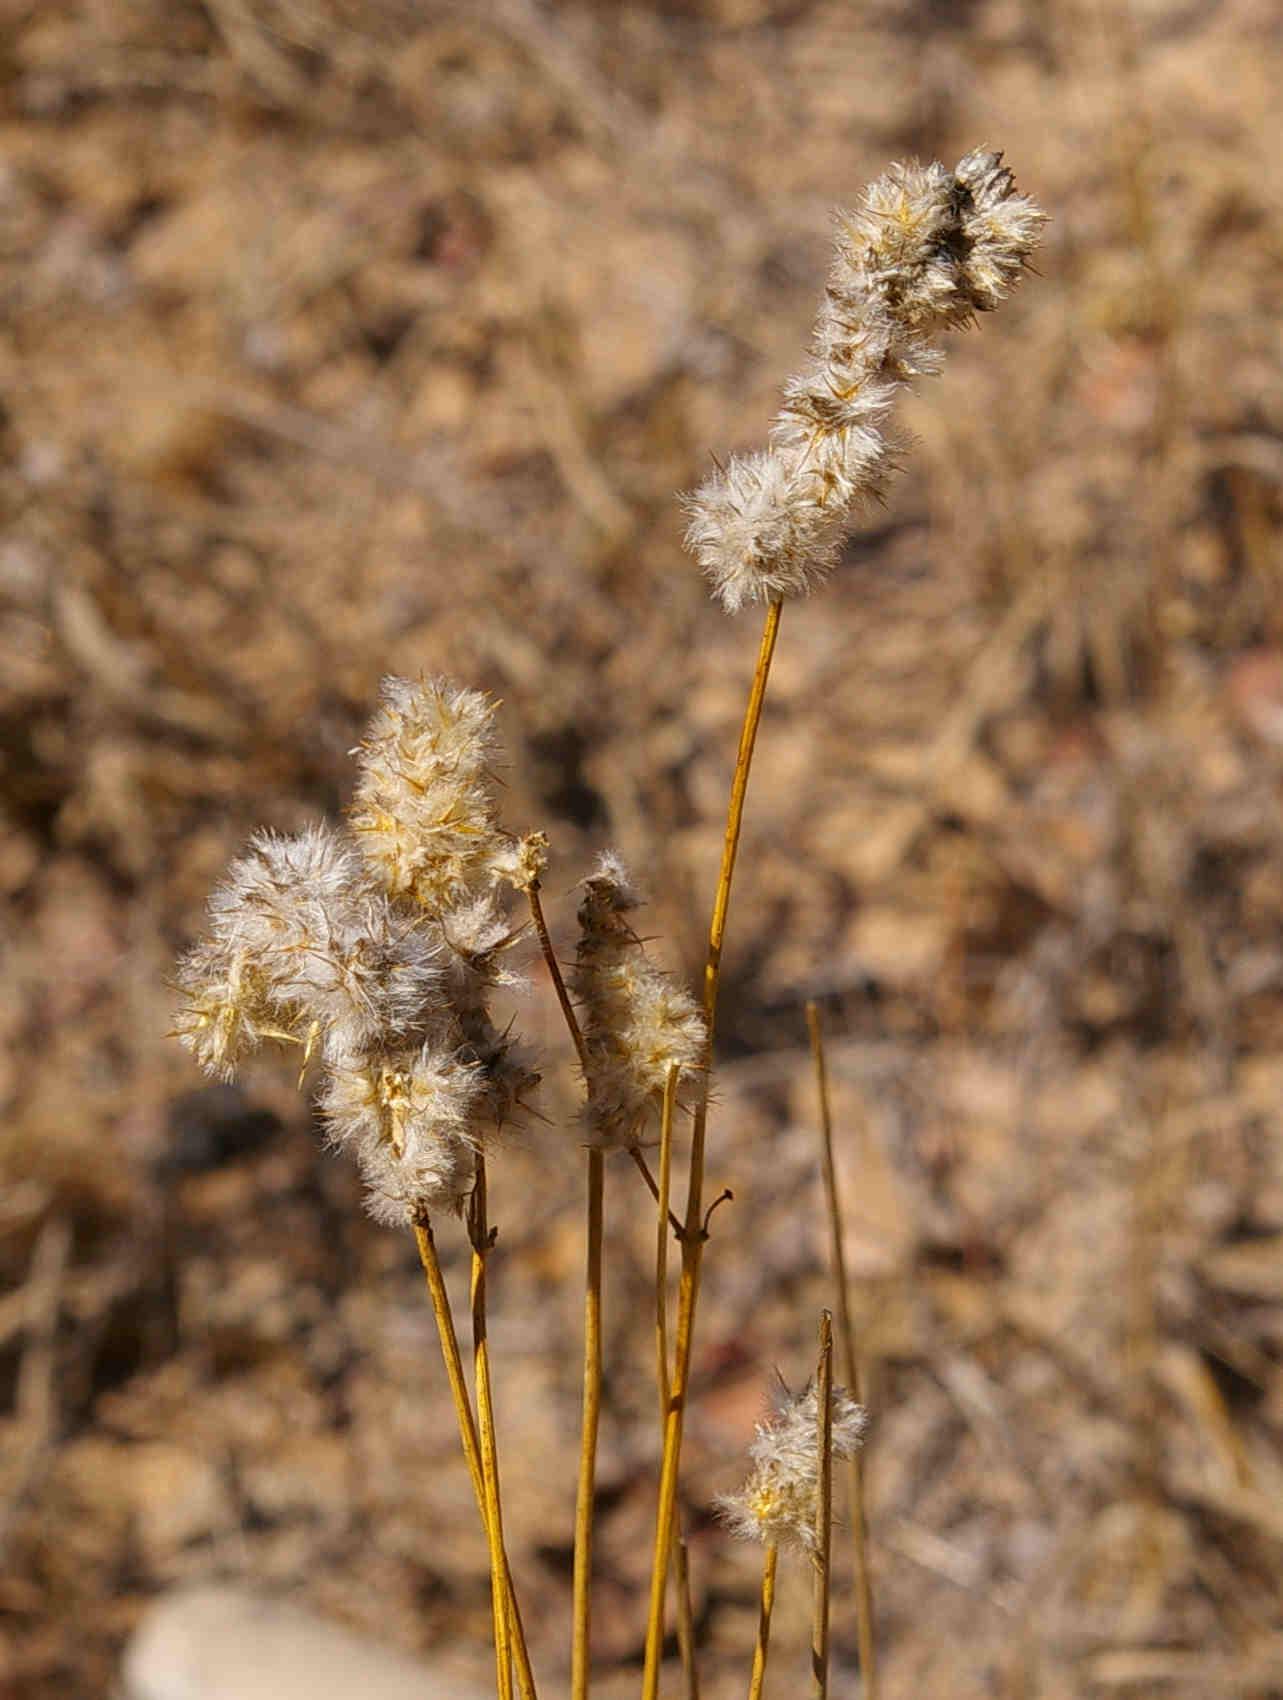 Kyphocarpa angustifolia